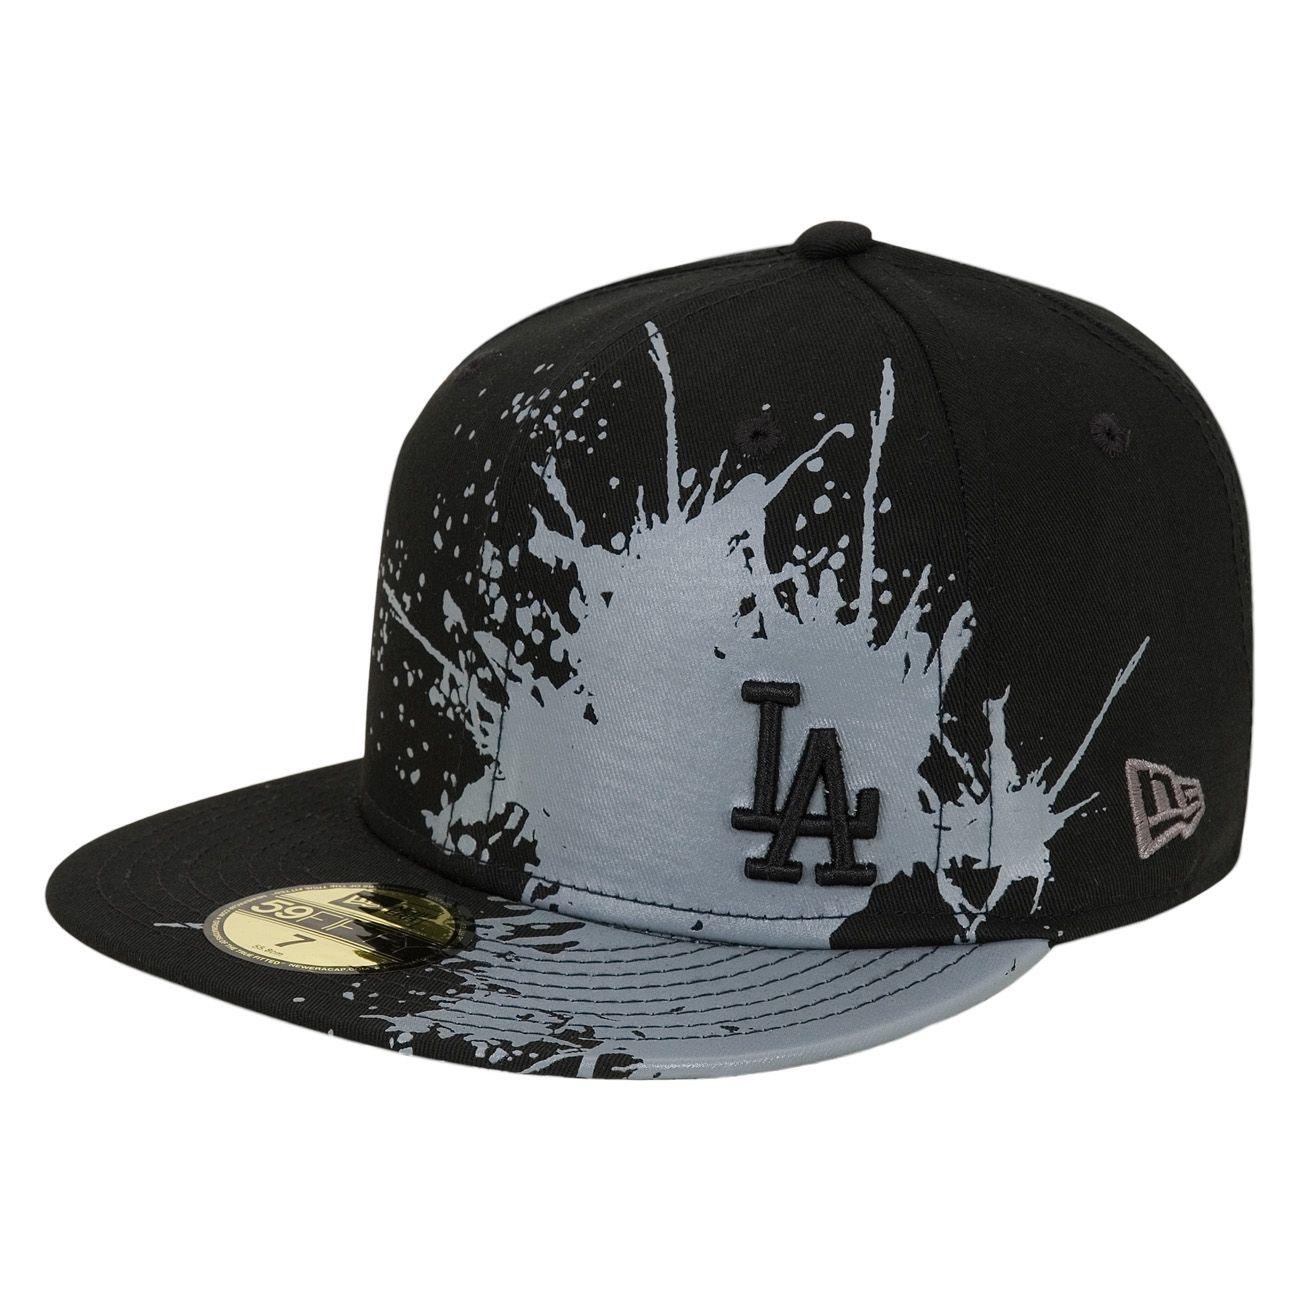 7fa4be4b6a7 Twenty One Pilots Hat, King Hat, Caps For Men, Mens Caps, Cool